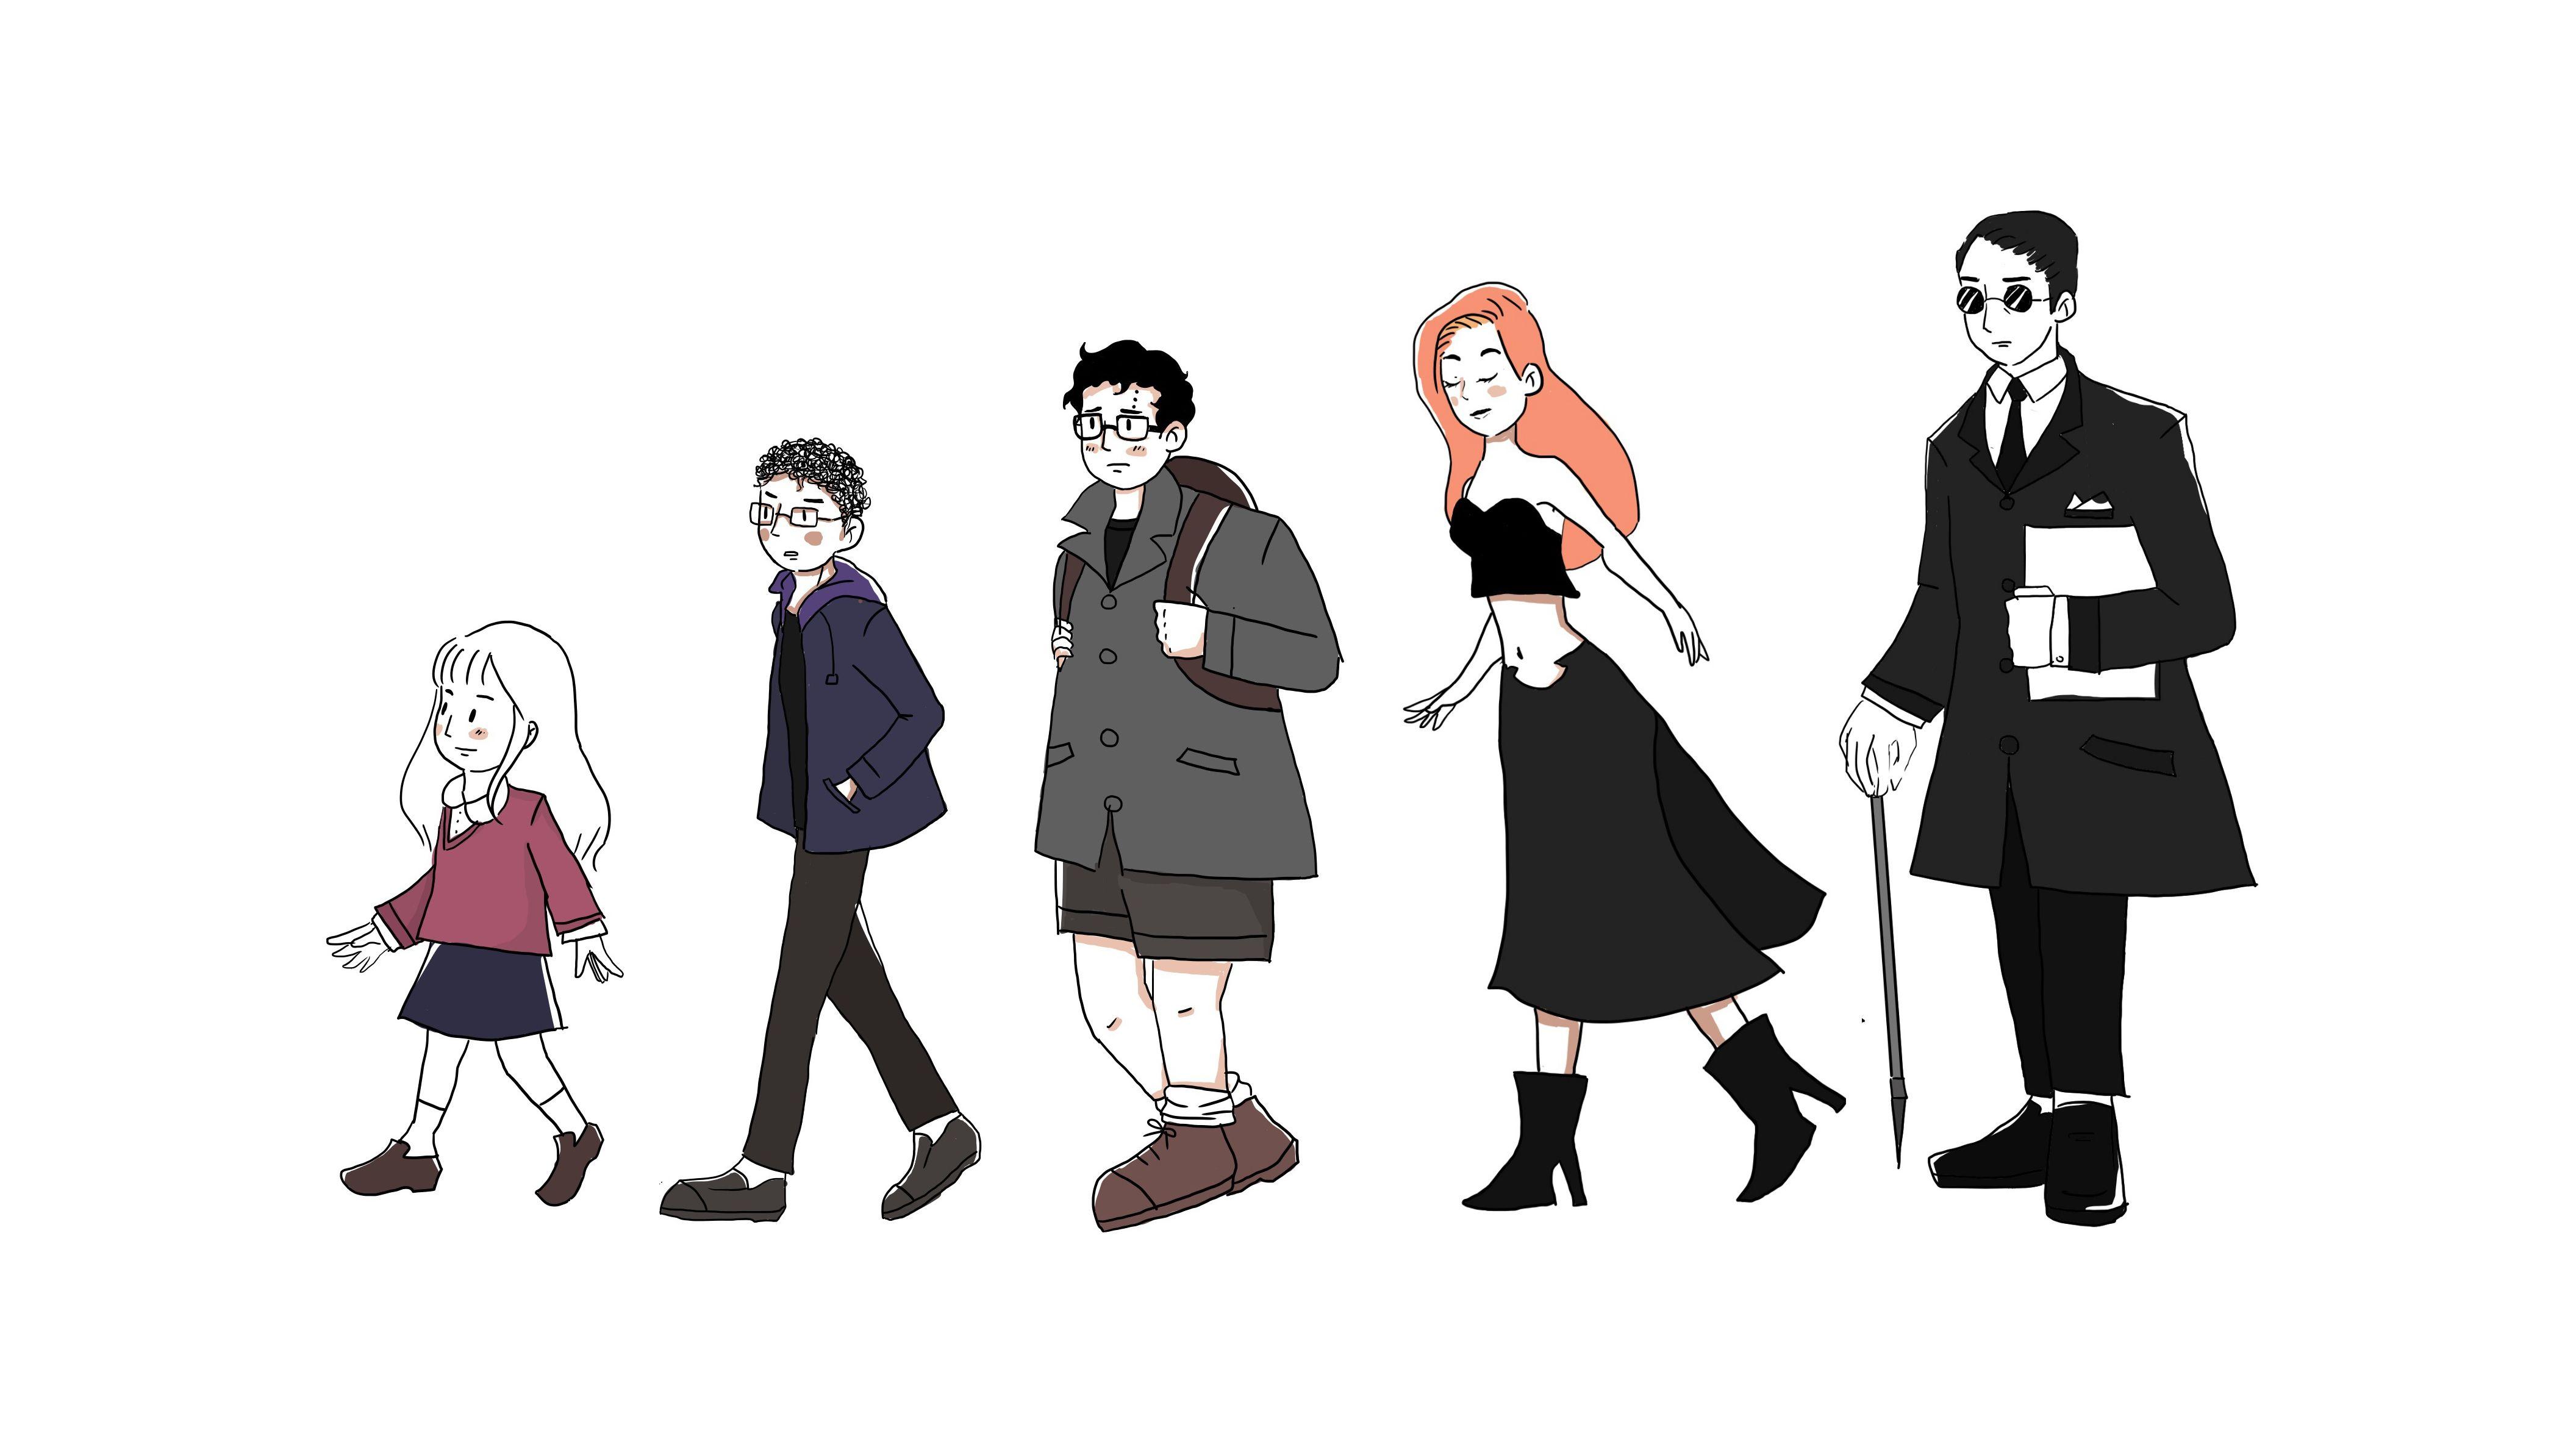 Personajes de la obra Demoncello